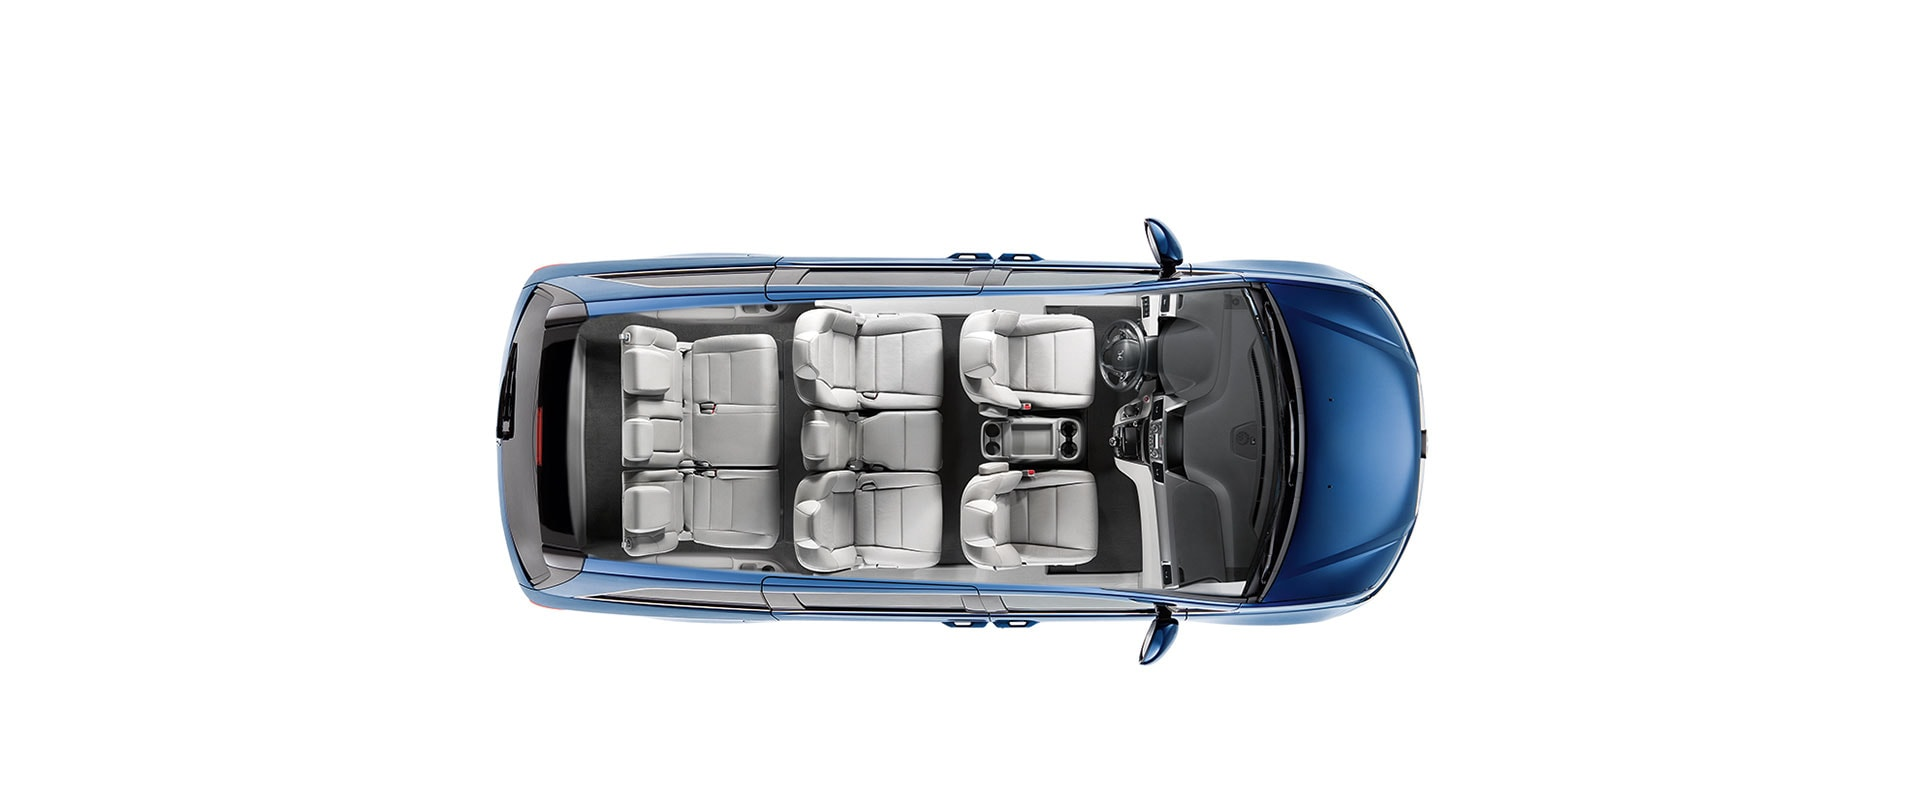 2016 Honda Pilot Configurations >> 2016 Honda Odyssey - Feature Details - Official Honda Site